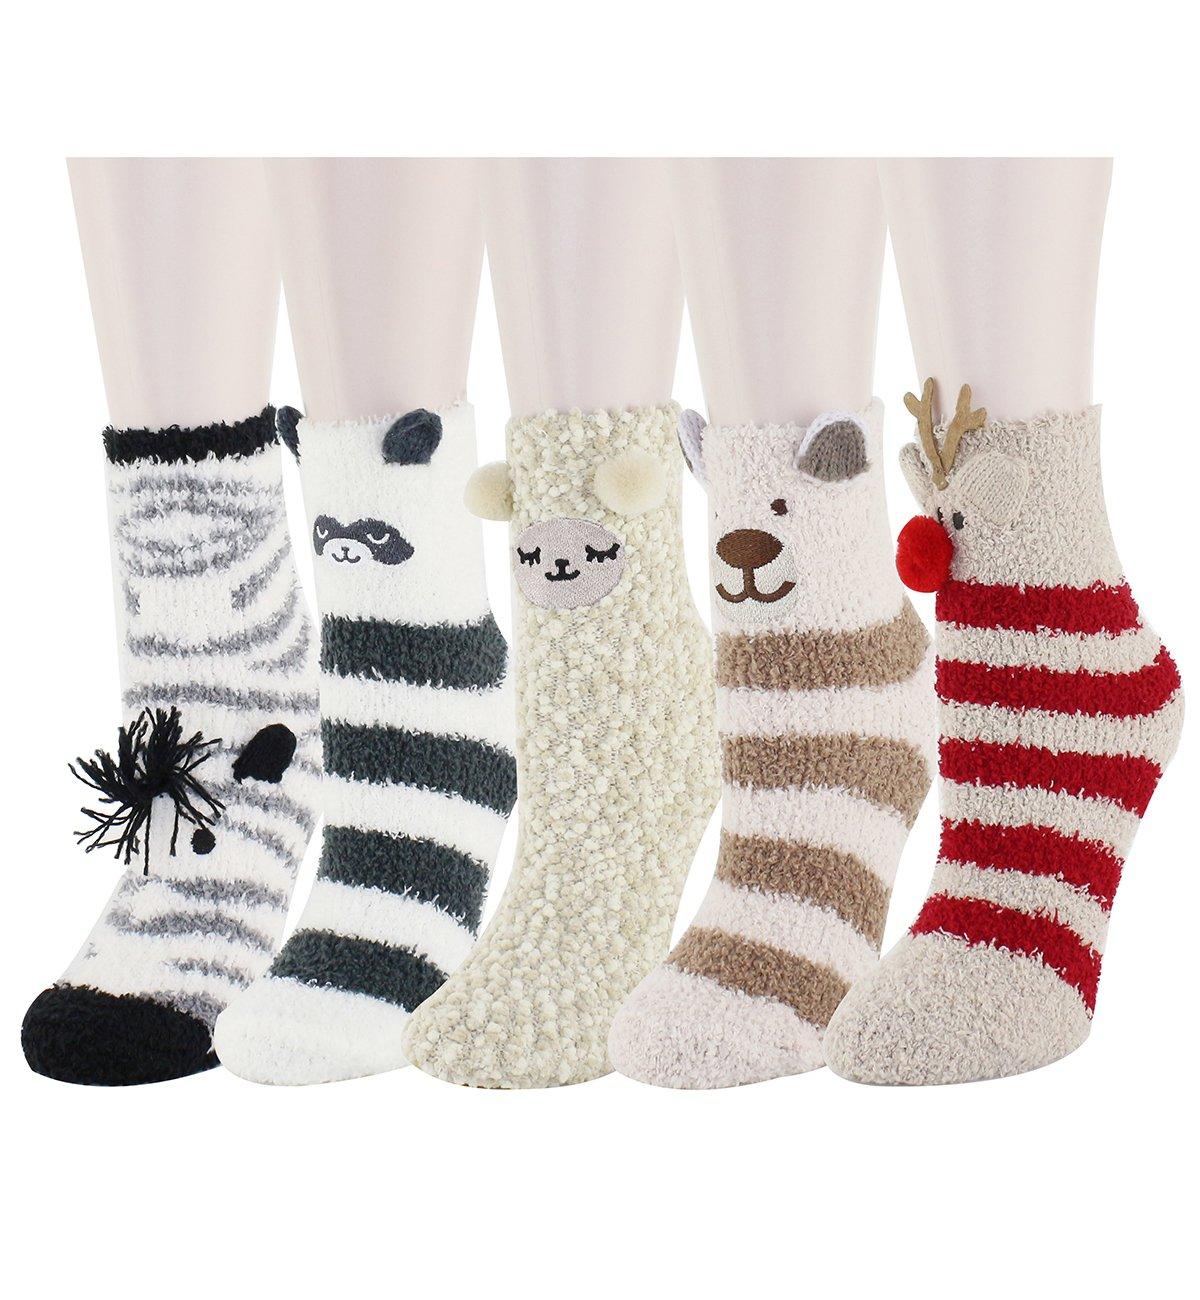 Happypop Women Girls Slipper Socks Cute Animals Fuzzy Crew Winter Warm Socks Thermal Socks (5 Pack-Animals)